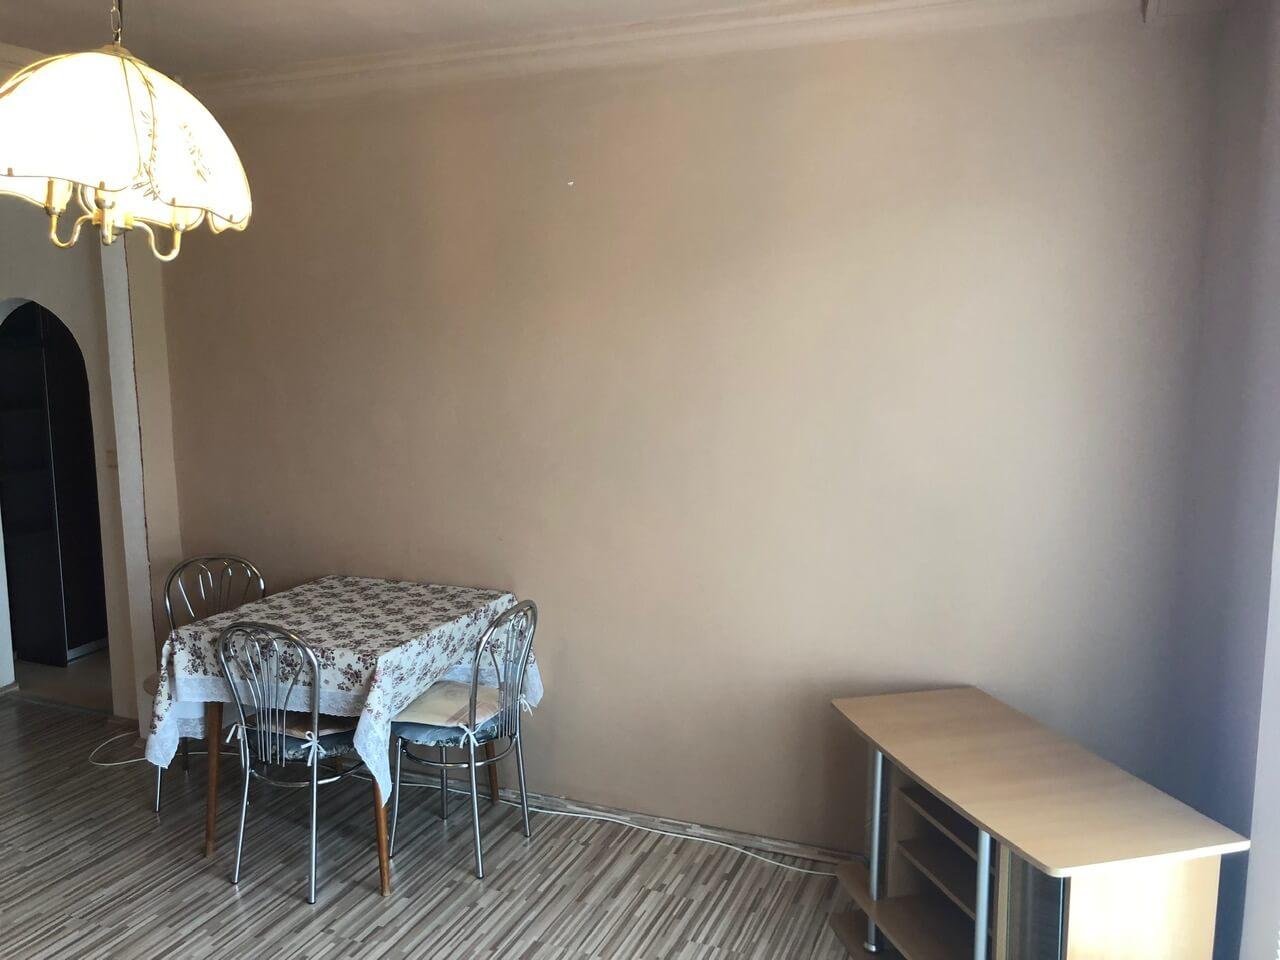 3 izbový byt, Račianska 85, 63m2, balkon 10m2, výborná lokalita-36